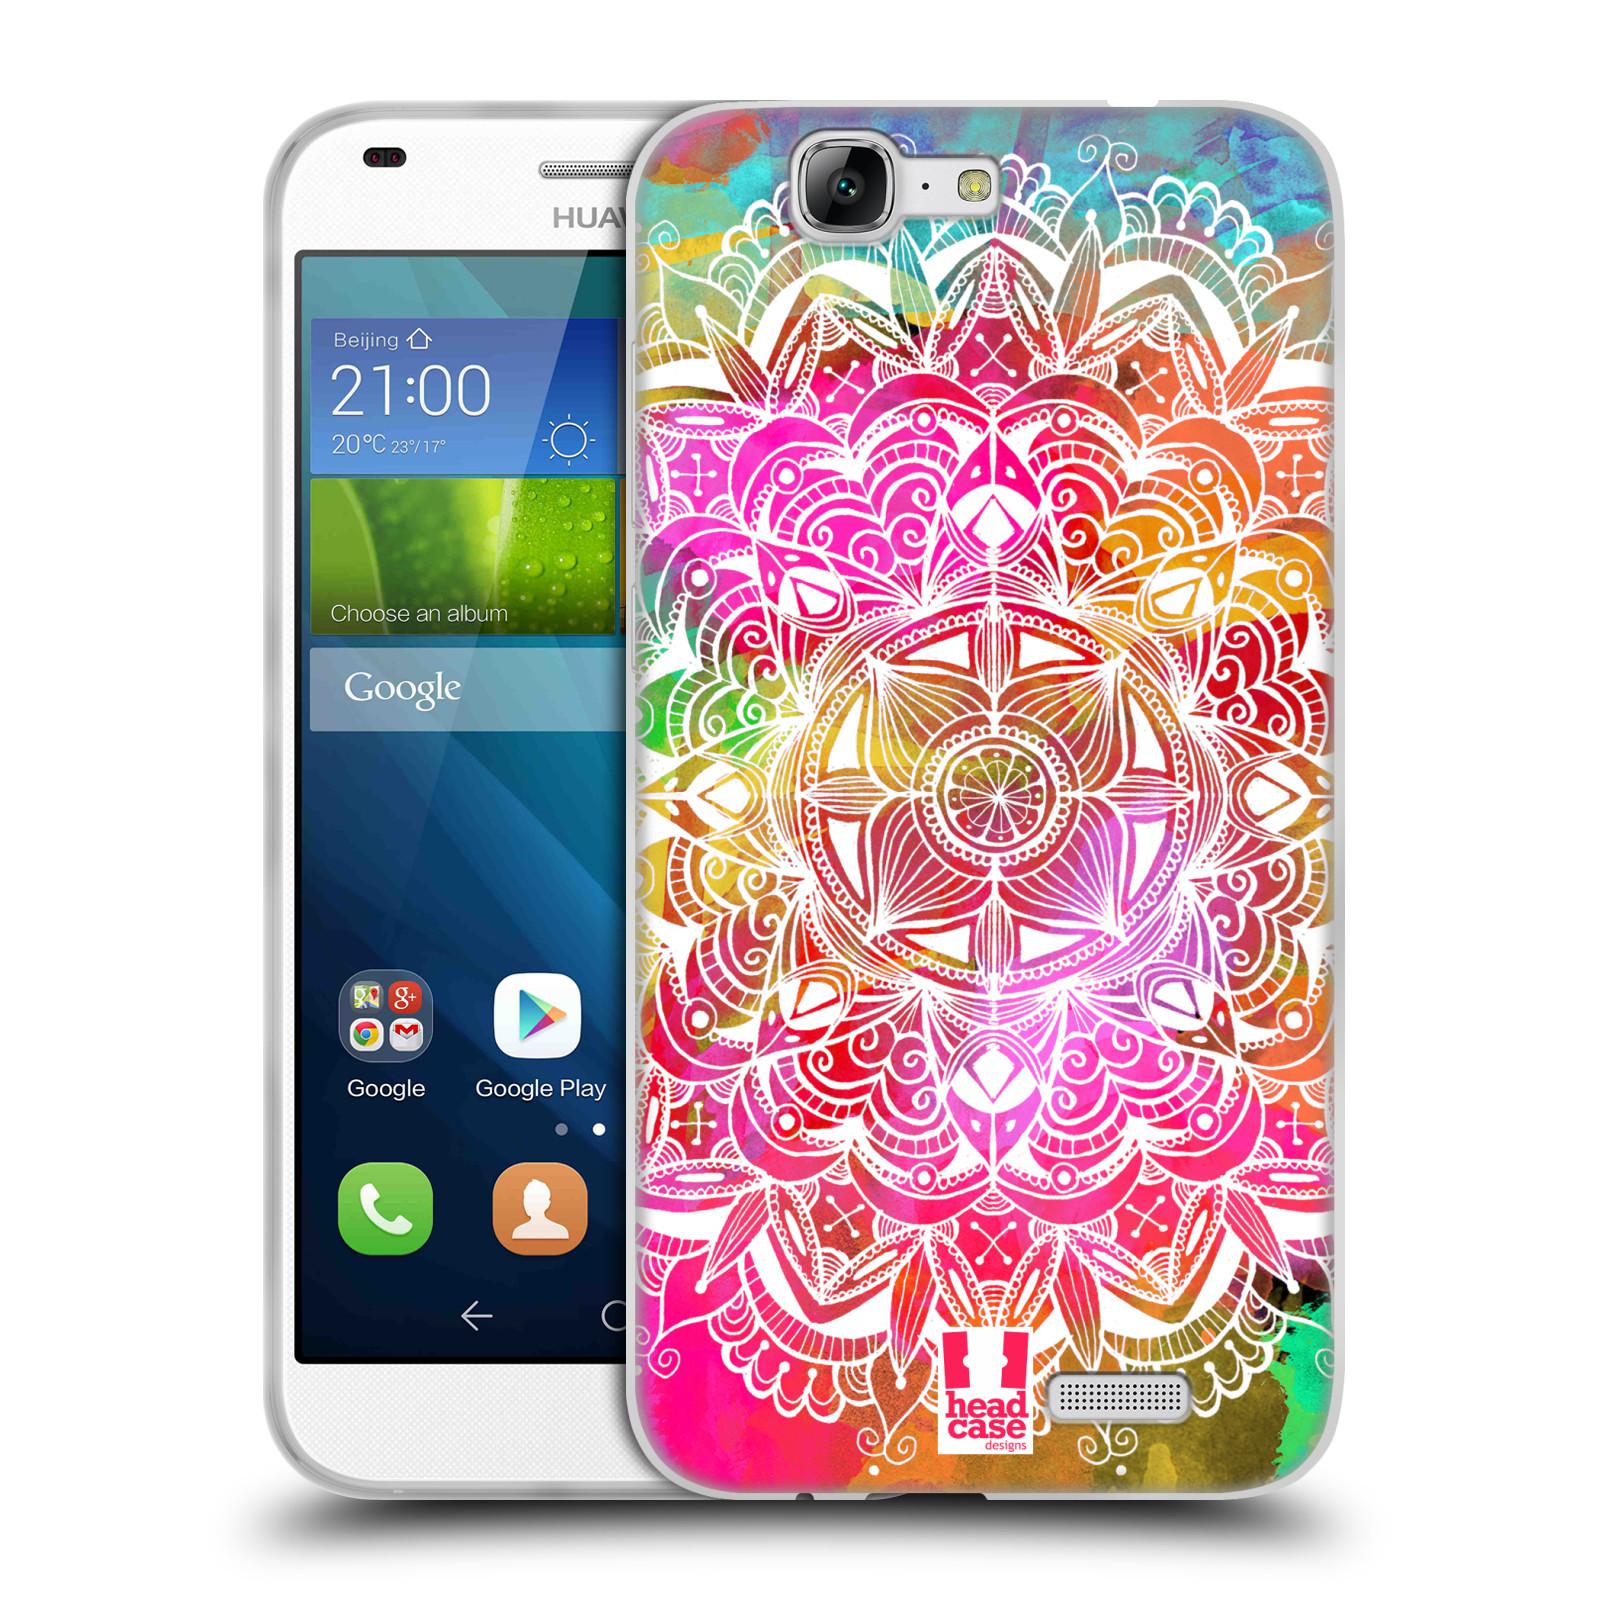 Silikonové pouzdro na mobil Huawei Ascend G7 HEAD CASE Mandala Doodle Watercolour (Silikonový kryt či obal na mobilní telefon Huawei Ascend G7)